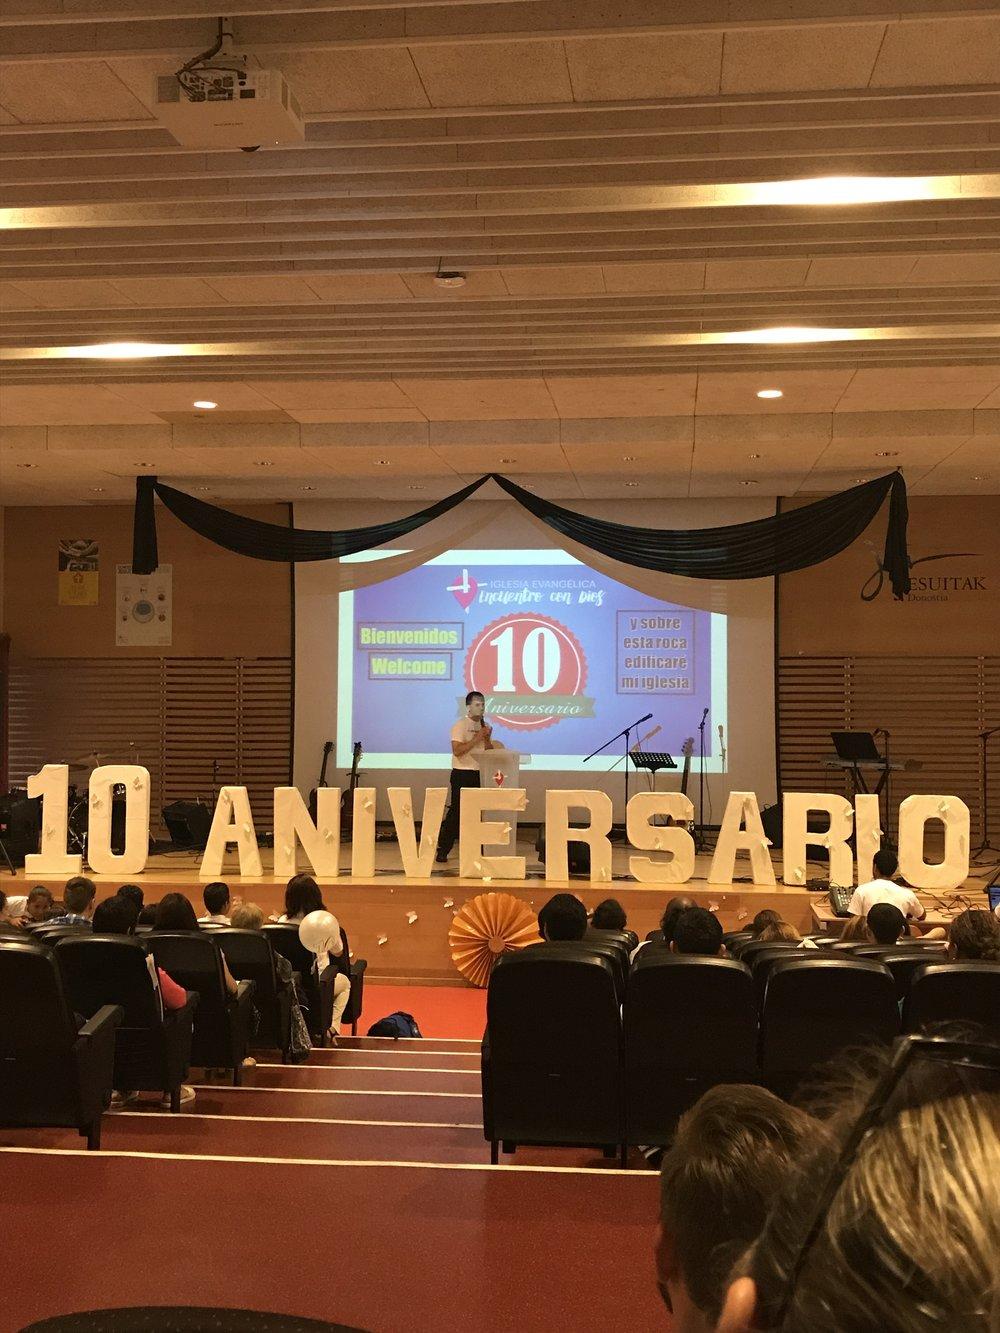 Celebrating 10 year Anniversary - Encuentro con Dios